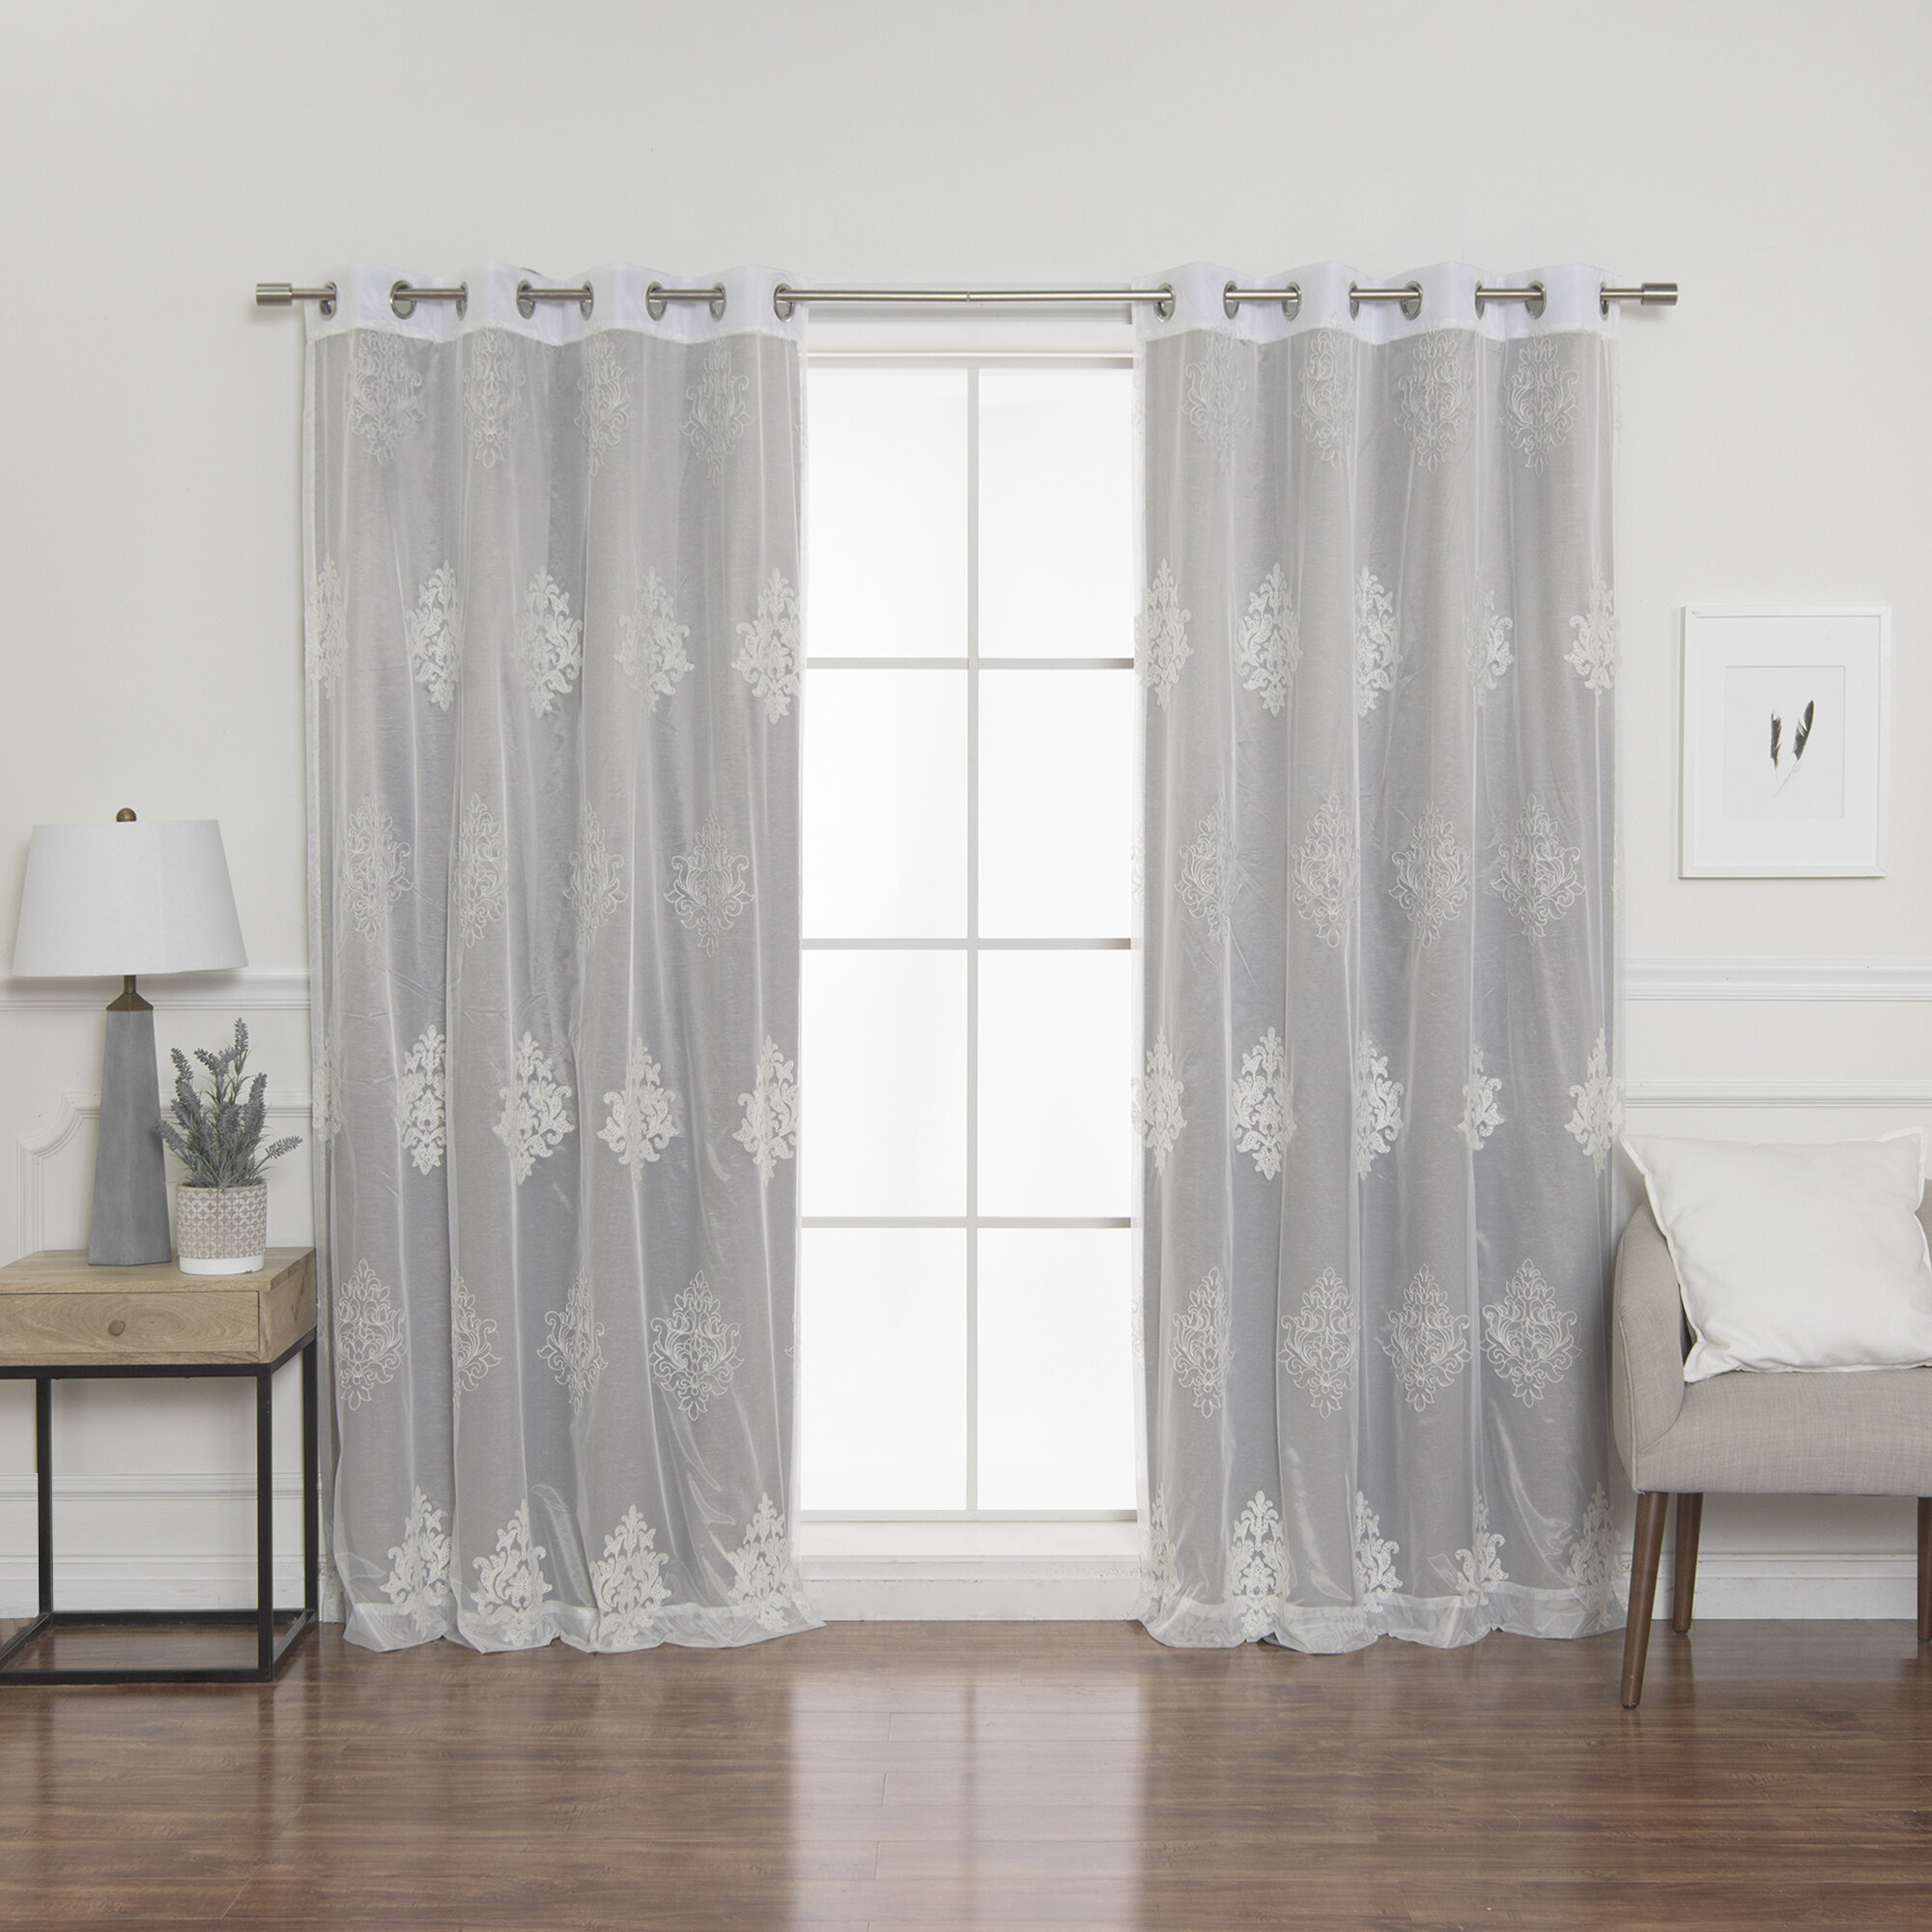 Best Home Fashion, Inc Damask Blackout Grommet Curtain Panels &